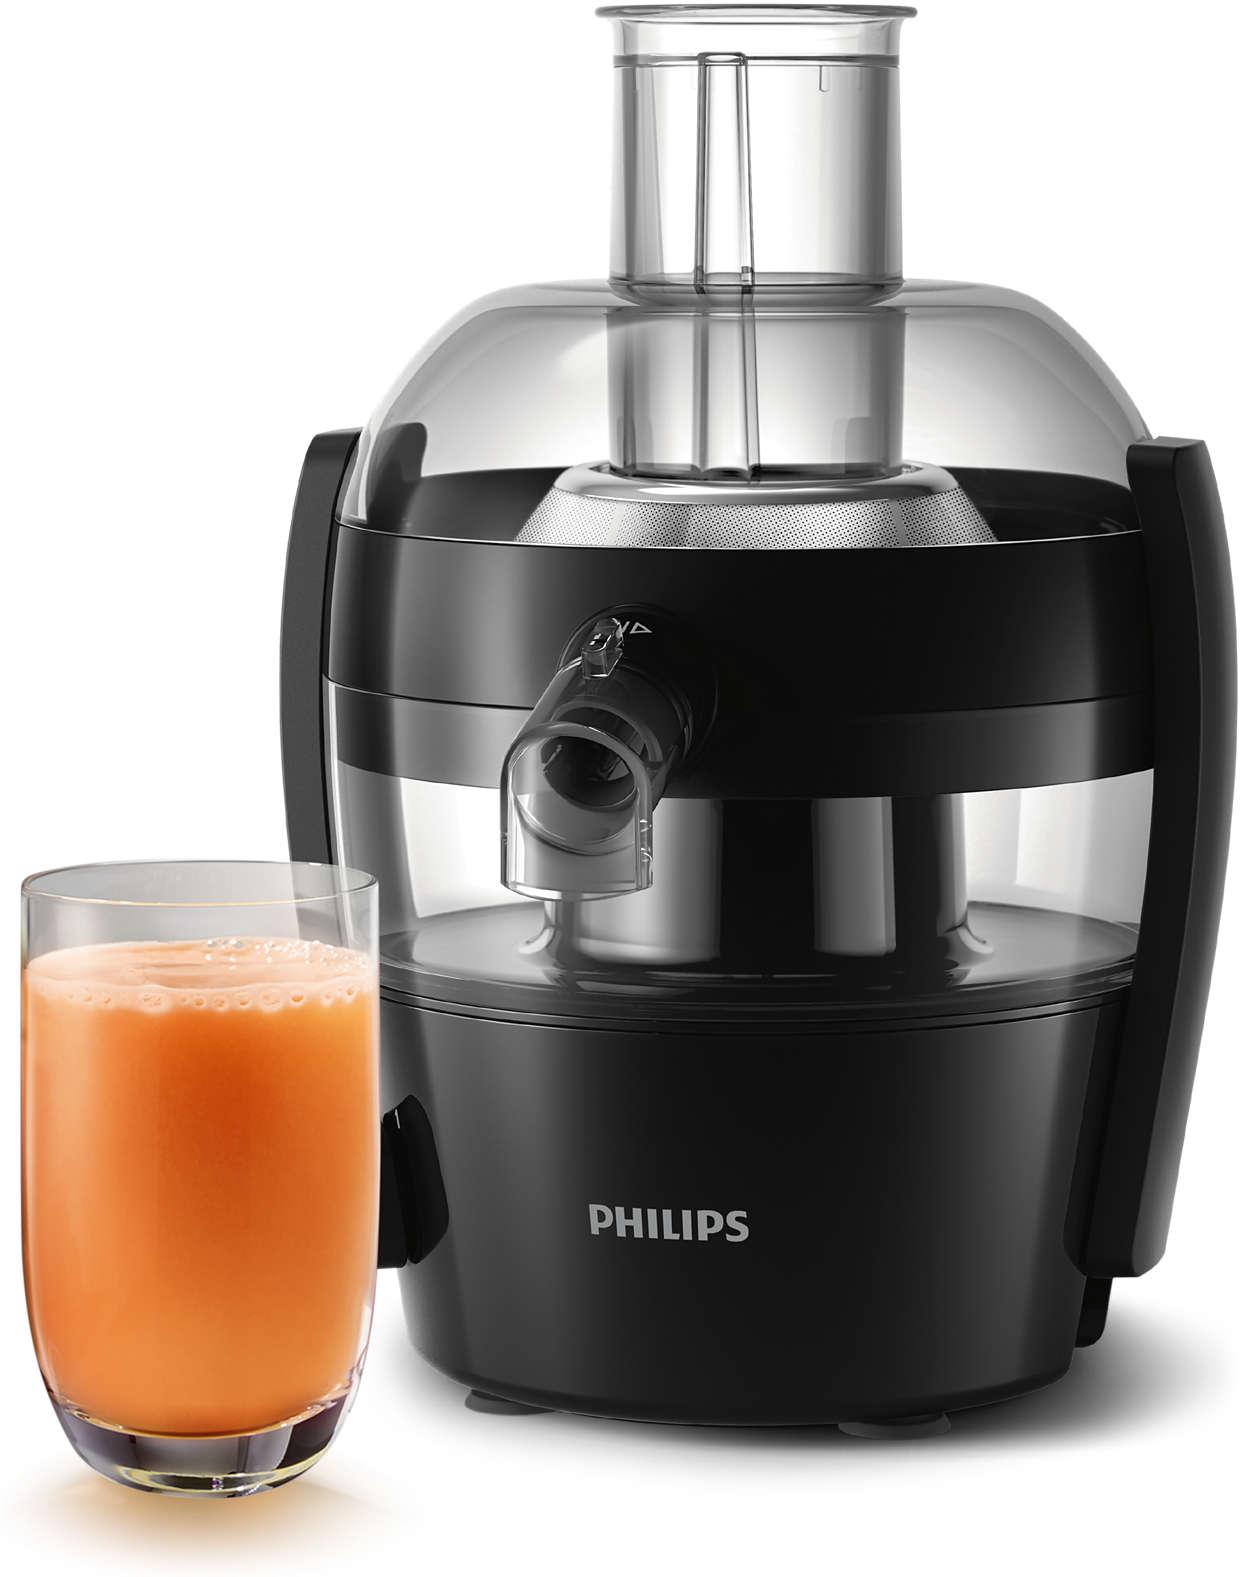 Philips Viva Collection HR1832 00